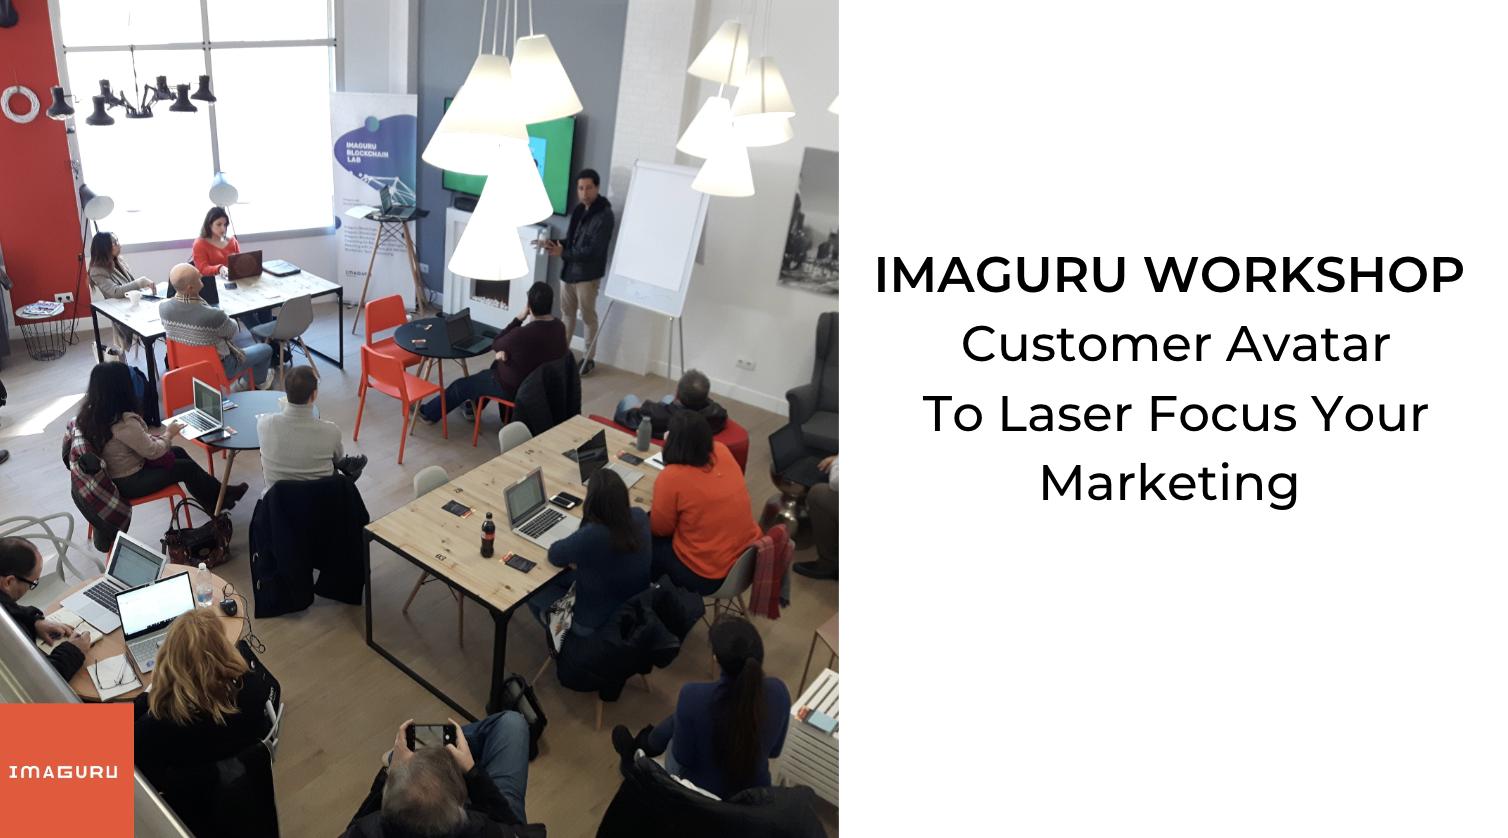 Workshop: Customer Avatar To Laser Focus Your Marketing